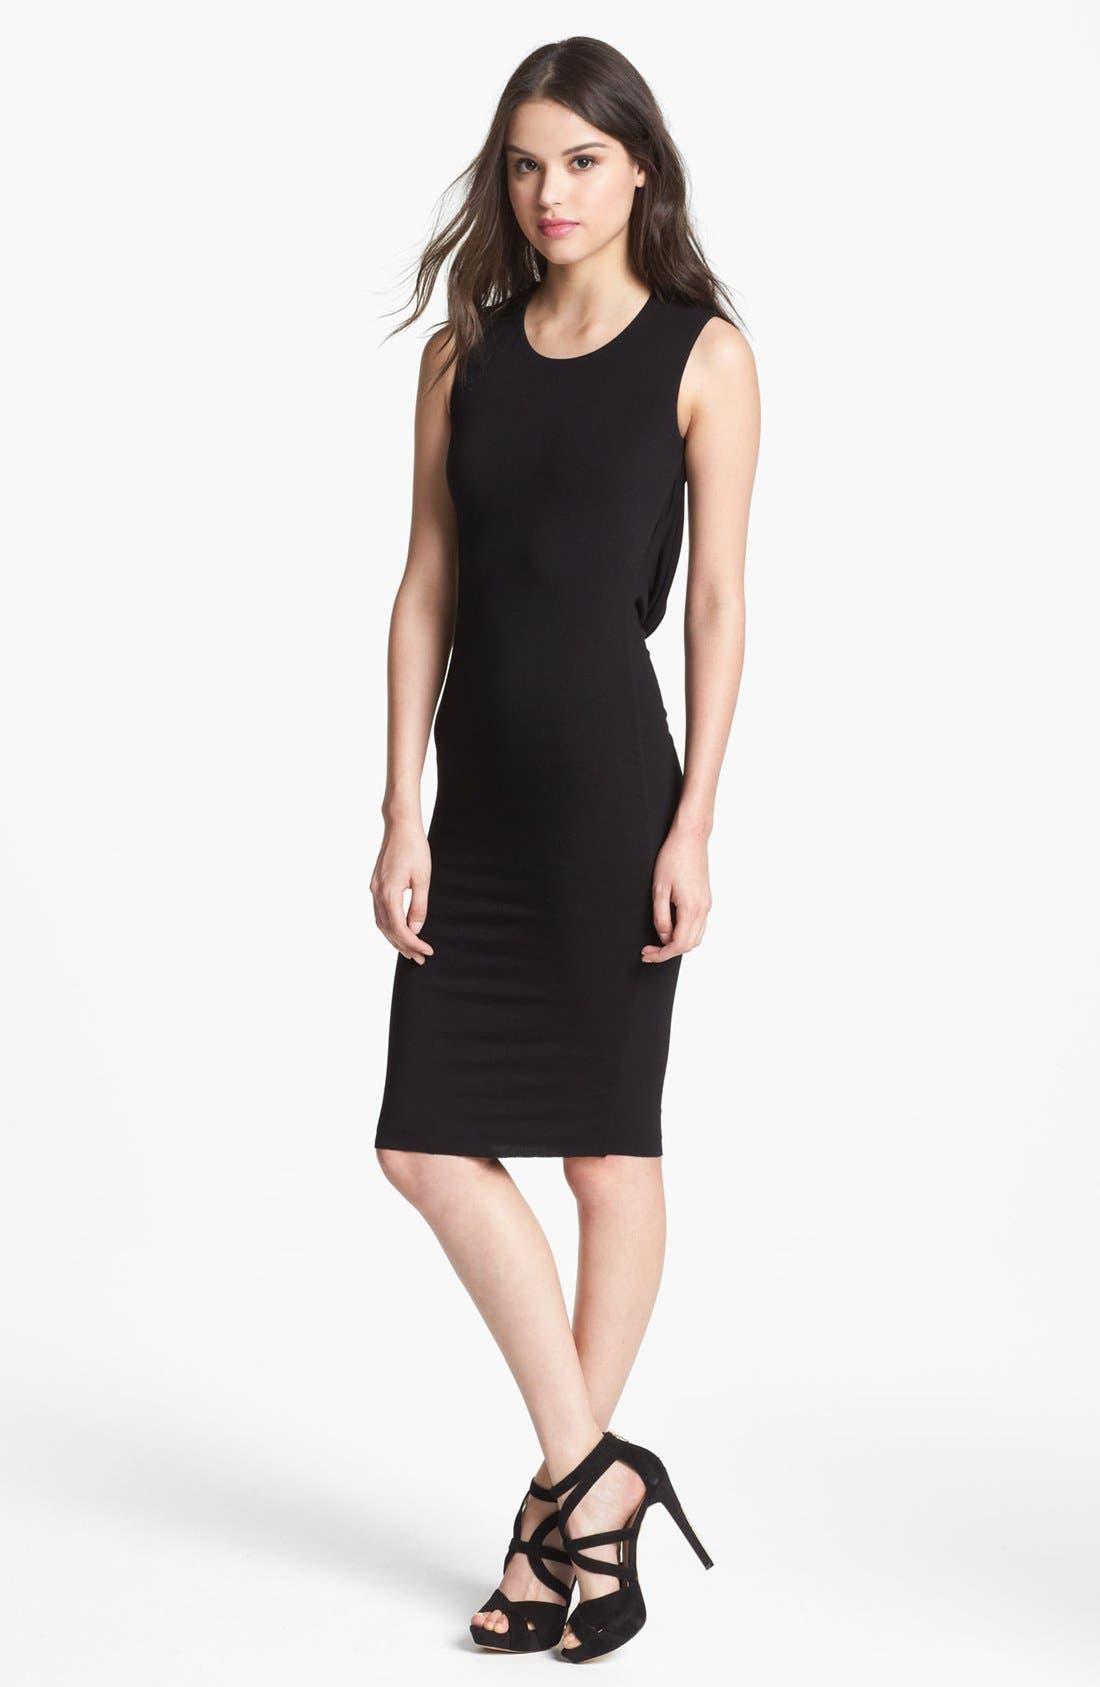 Main Image - Bailey 44 'Downforce' Dress